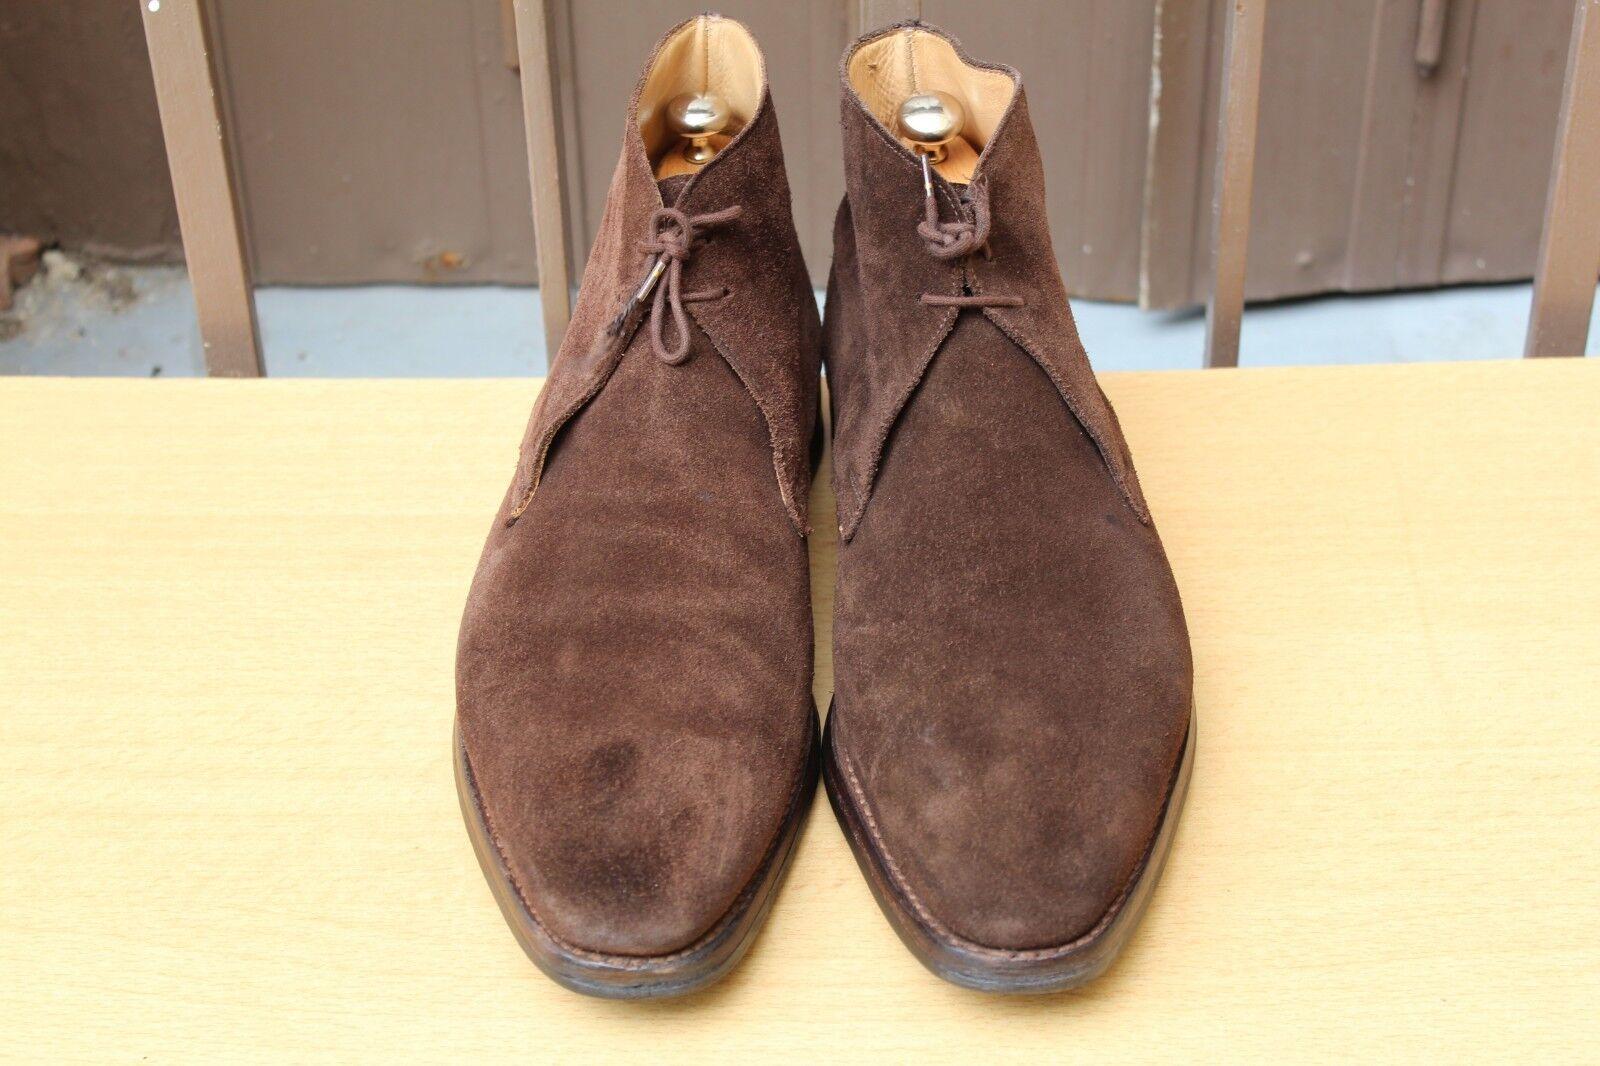 CHAUSSURE bota CROCKETT&JONES  TETBURY  DAIM 9,5 E 43,5 SUPER ETAT hombres zapatos